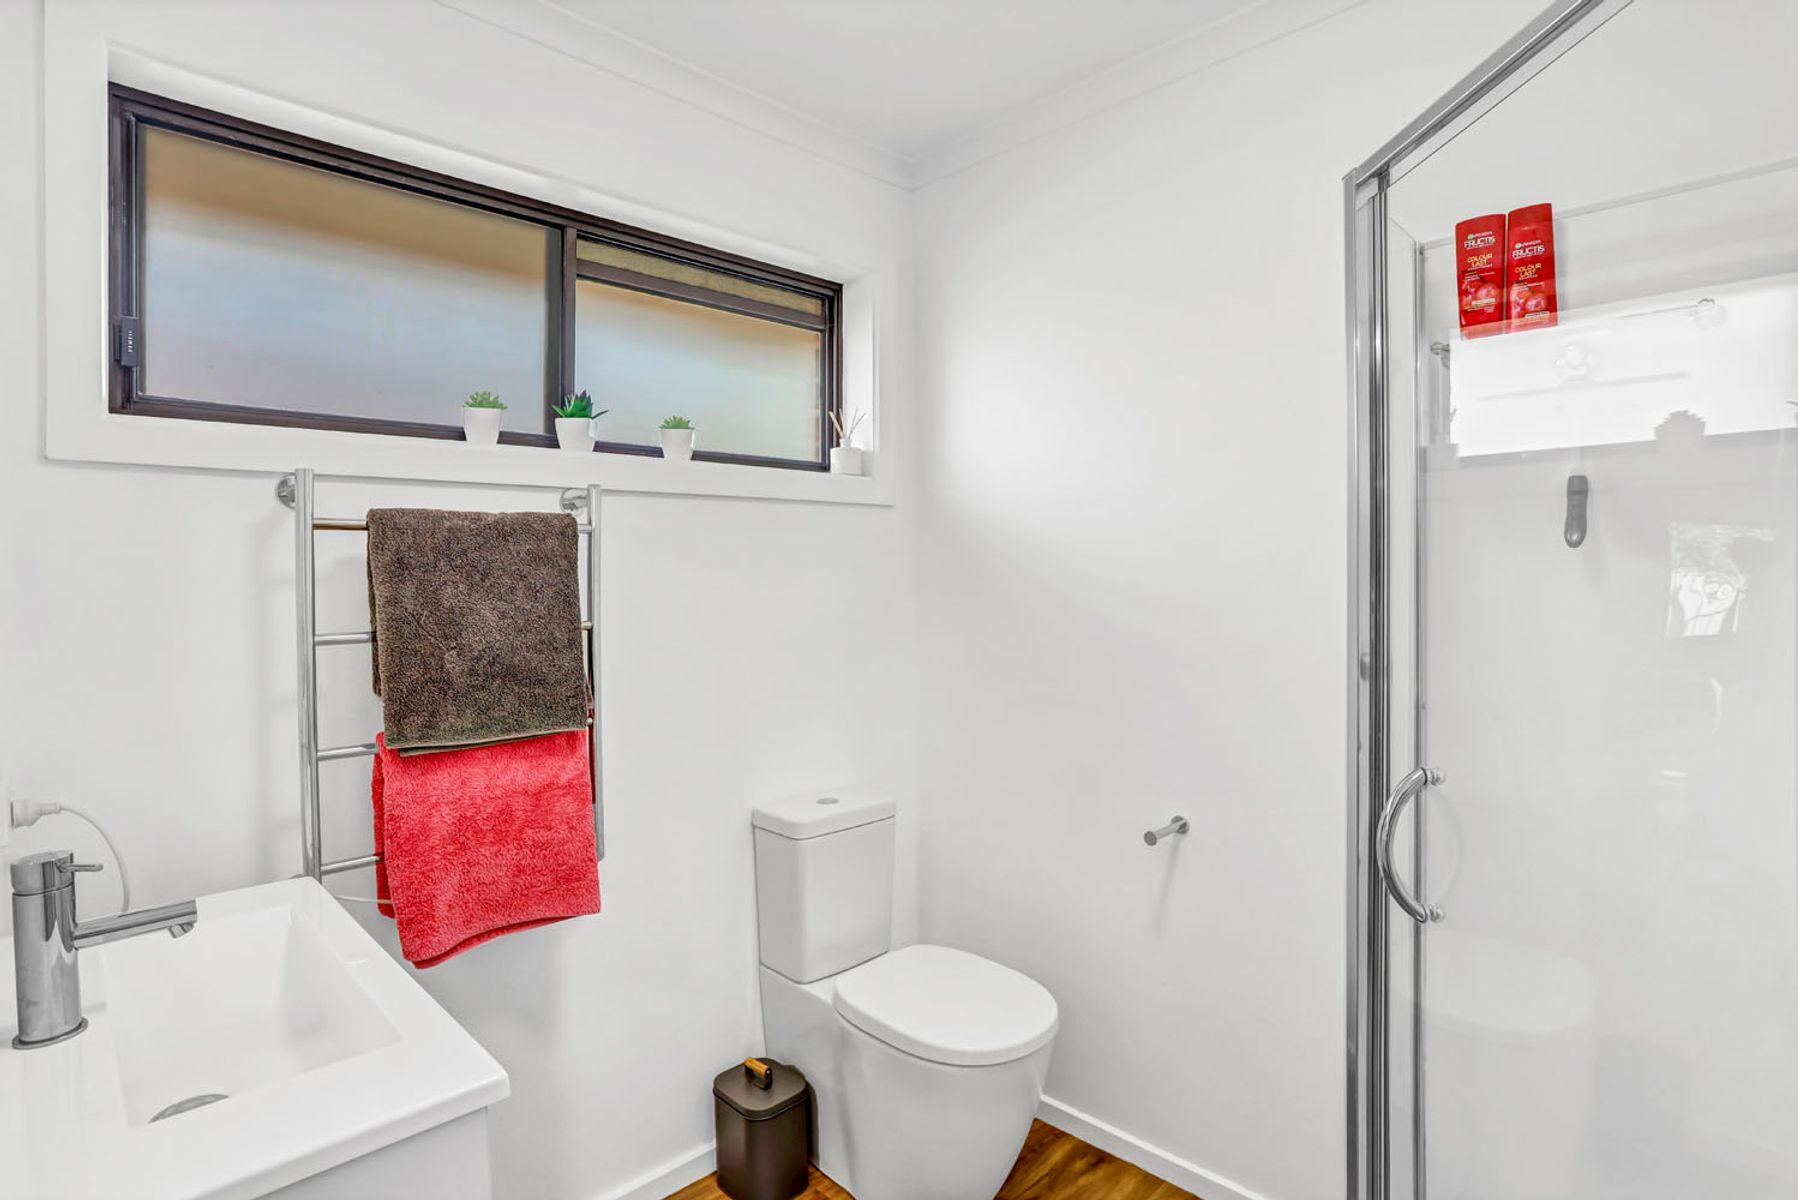 7 Giudice Street, Kangaroo Flat, VIC 3555